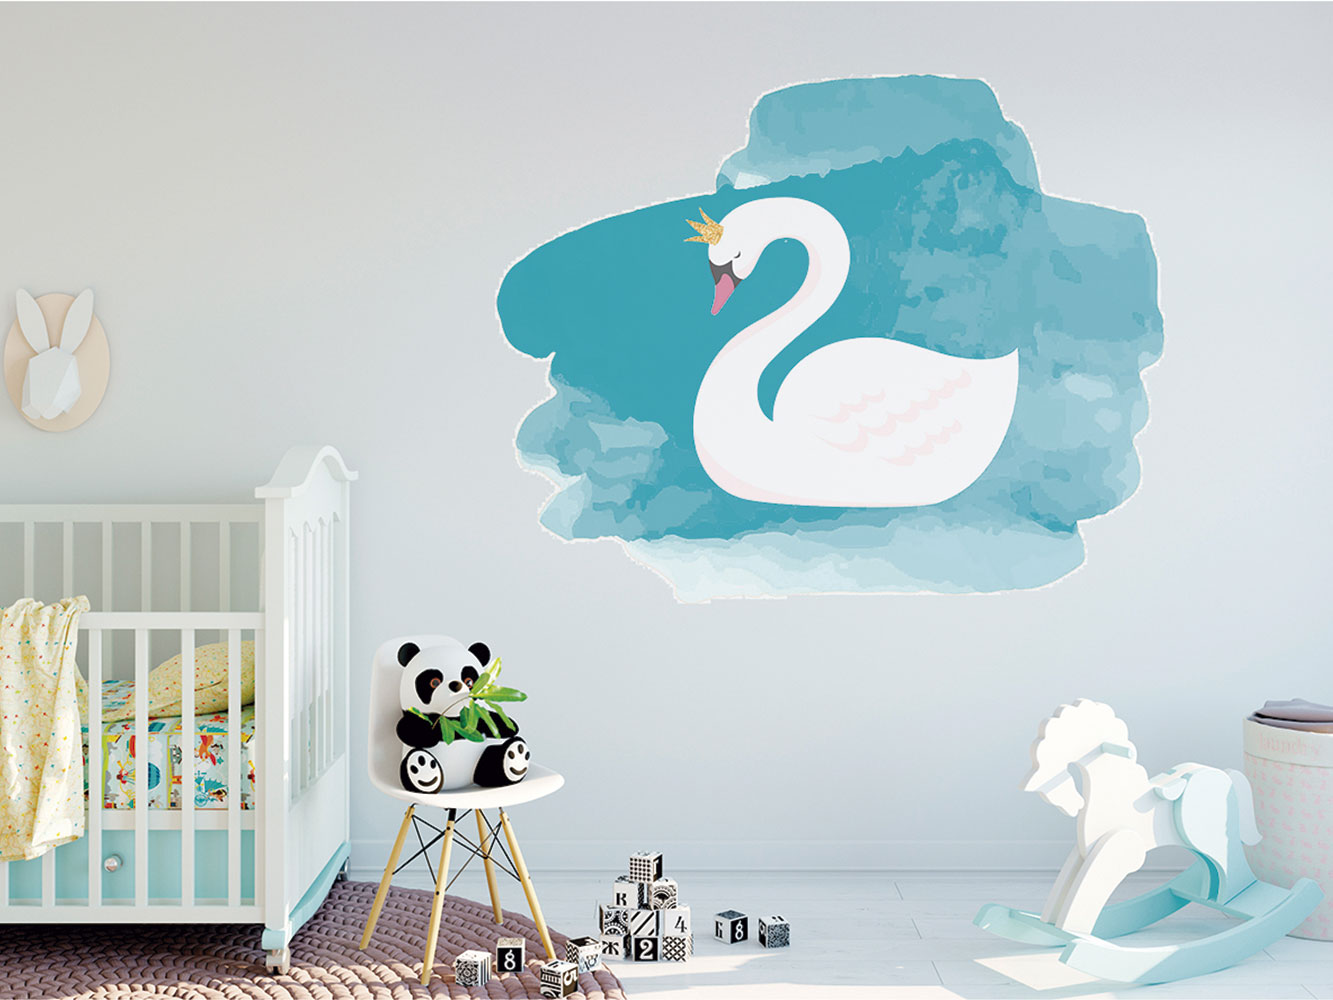 Vinilo Decorativo Infantil Cisne Acuarela | Carteles XXL - Impresión carteleria publicitaria